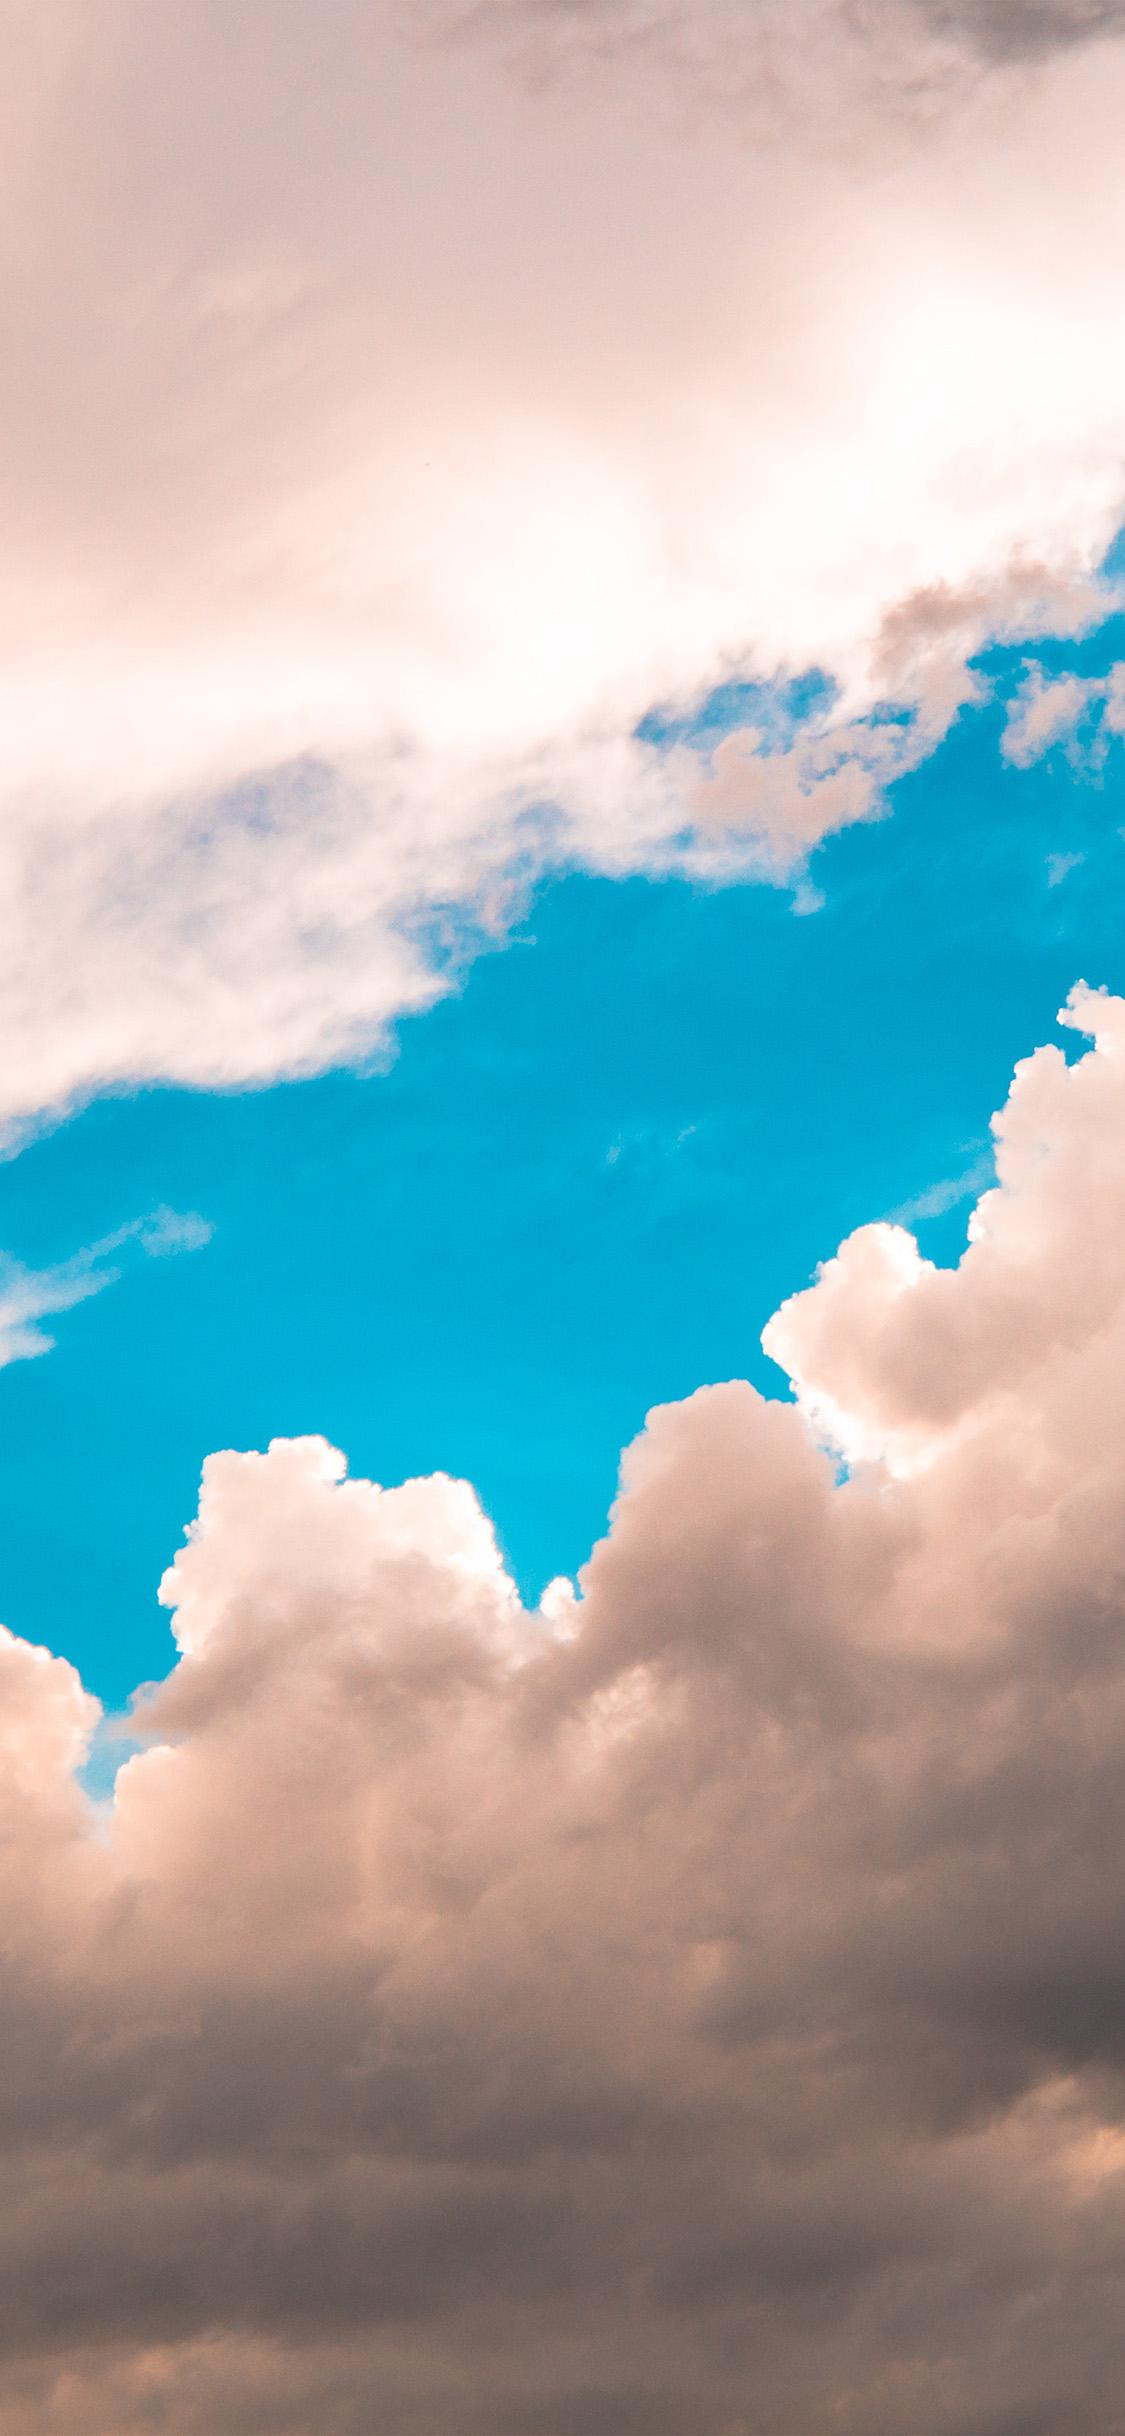 iPhonexpapers.com-Apple-iPhone-wallpaper-ny75-cloud-sky-summer-nature